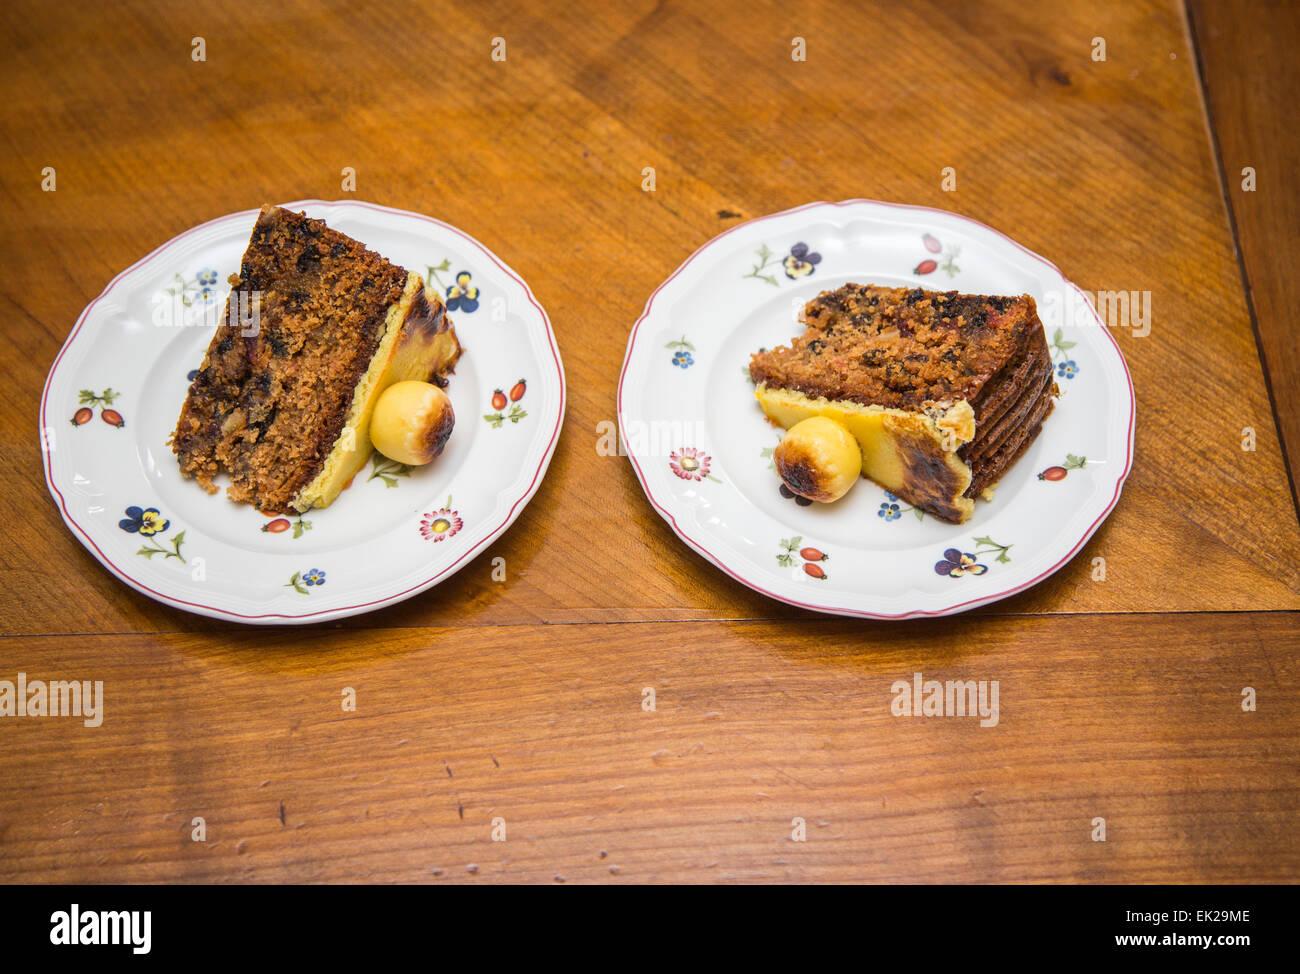 Dos rebanadas de Pascua tradicional simnel cake, un pastel de frutas con mazapán topping y bolas sirve en China Imagen De Stock